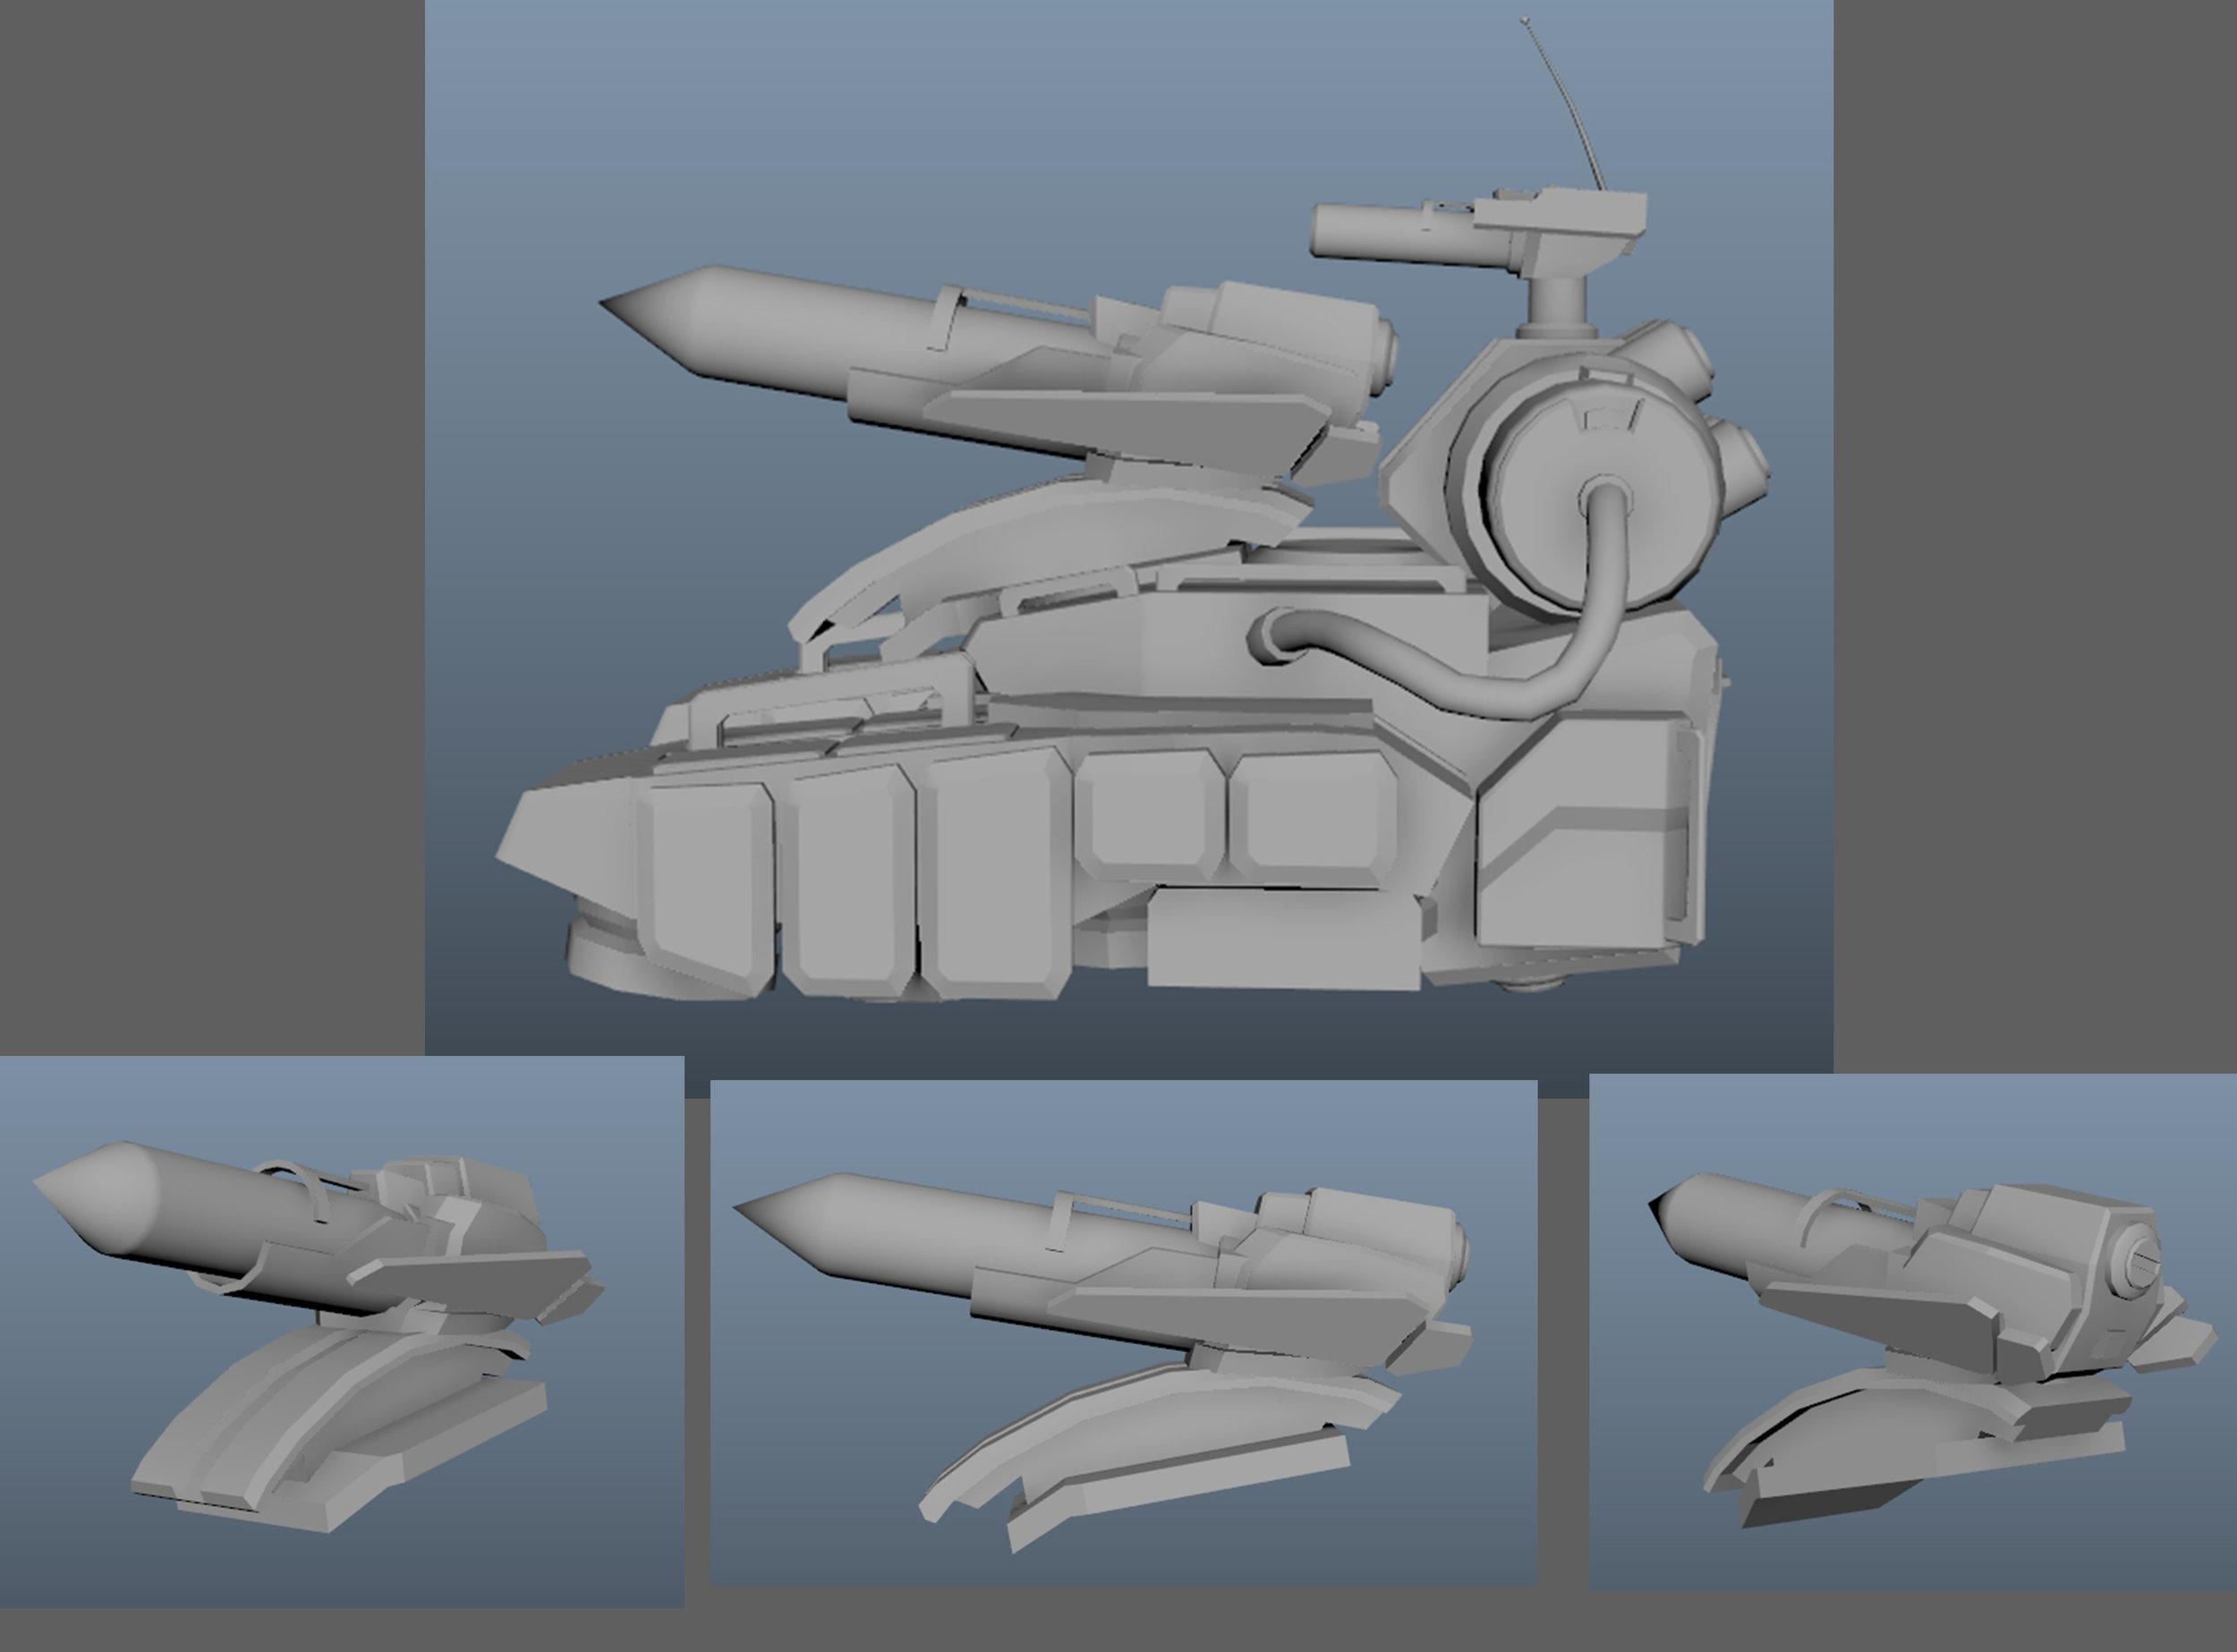 Chomper Model #1